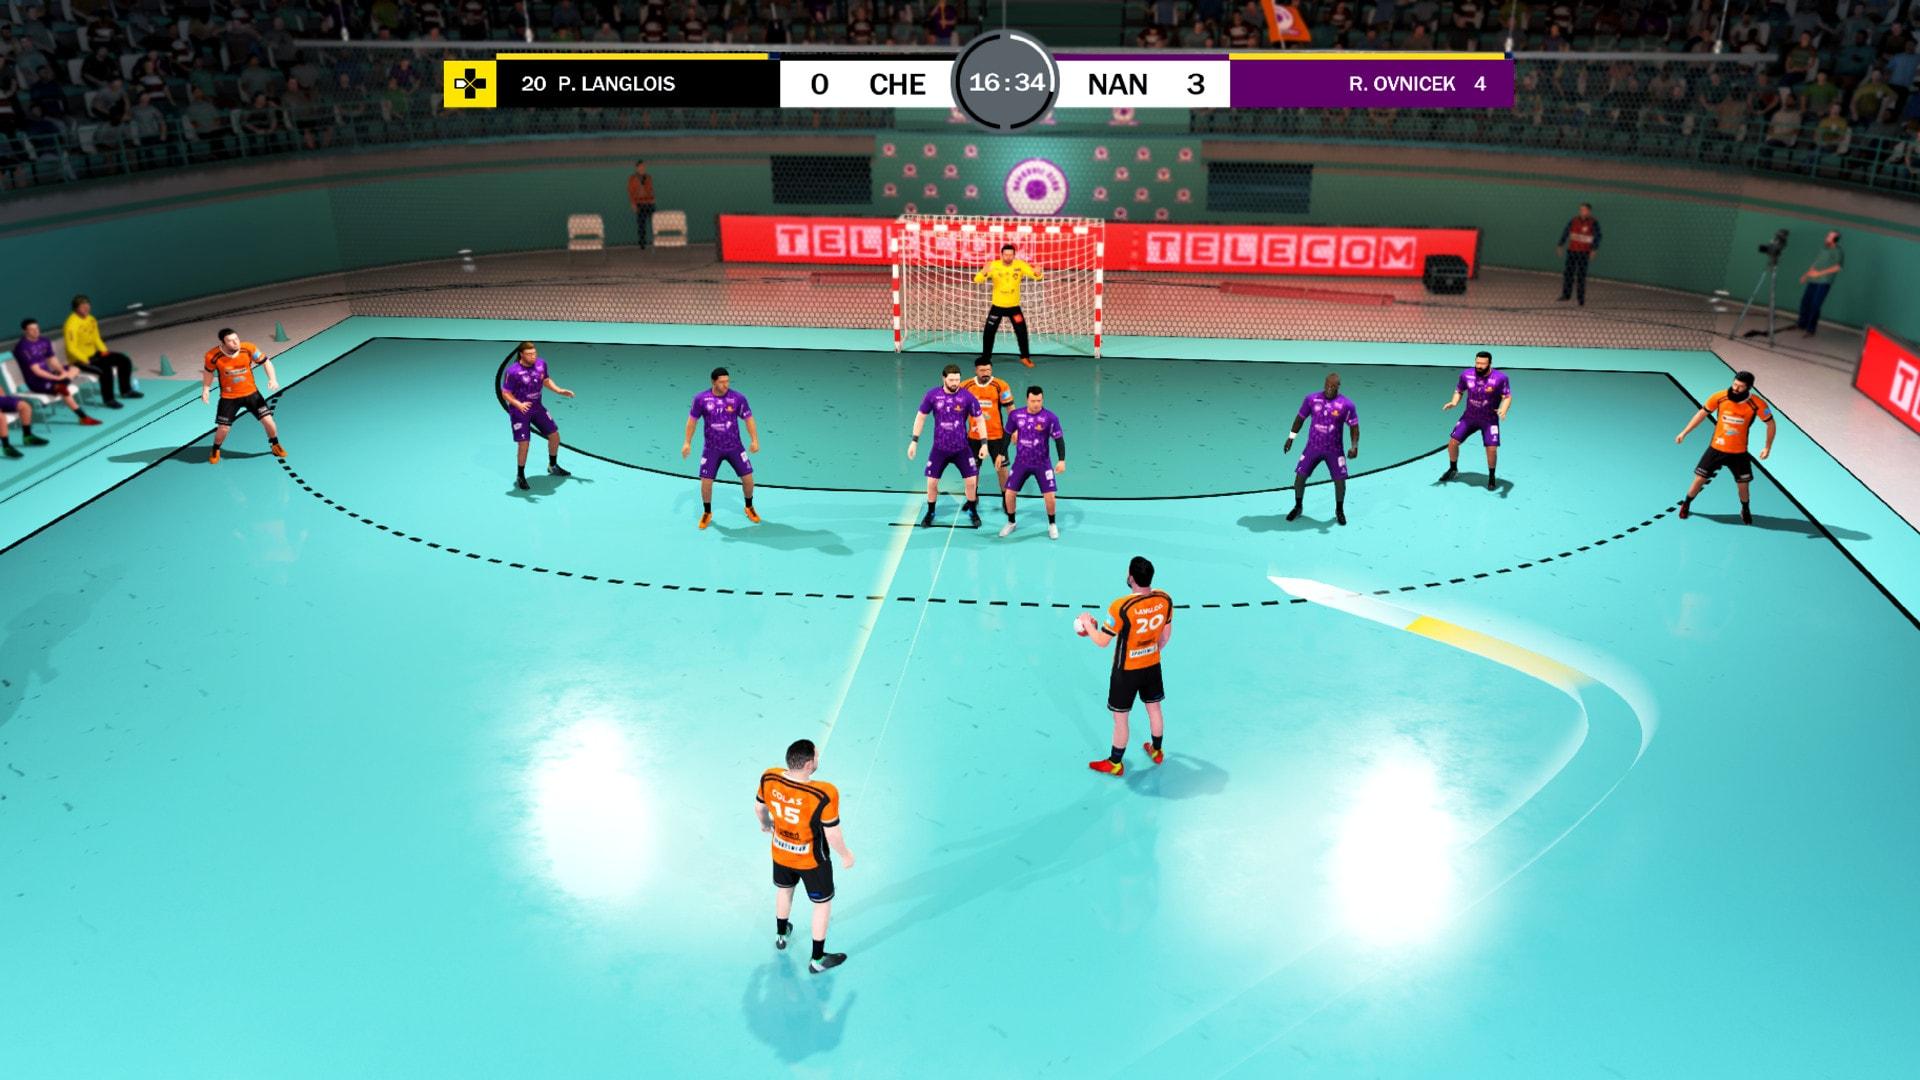 Handball 21 (PC) - Steam Gift - GLOBAL - 4